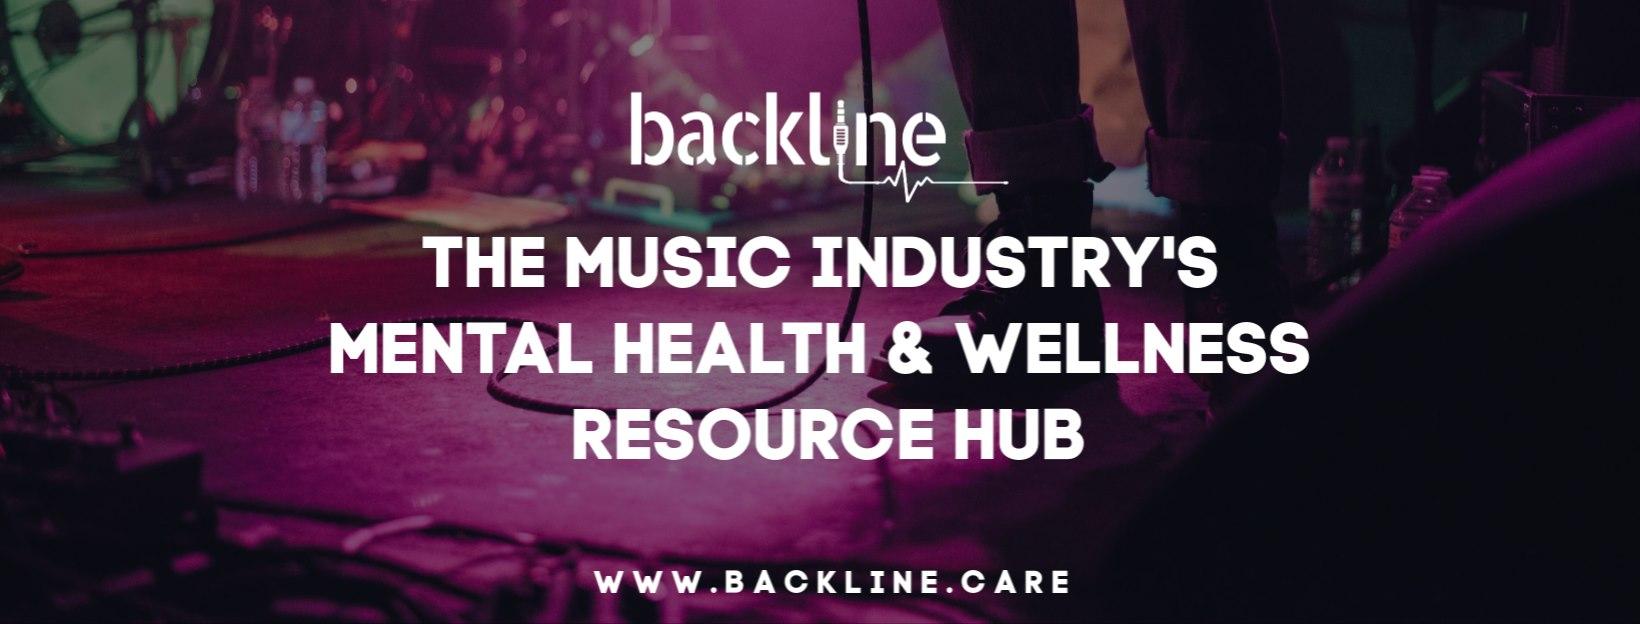 Backline: The Music Industry's Mental Health & Wellness Resource Hub